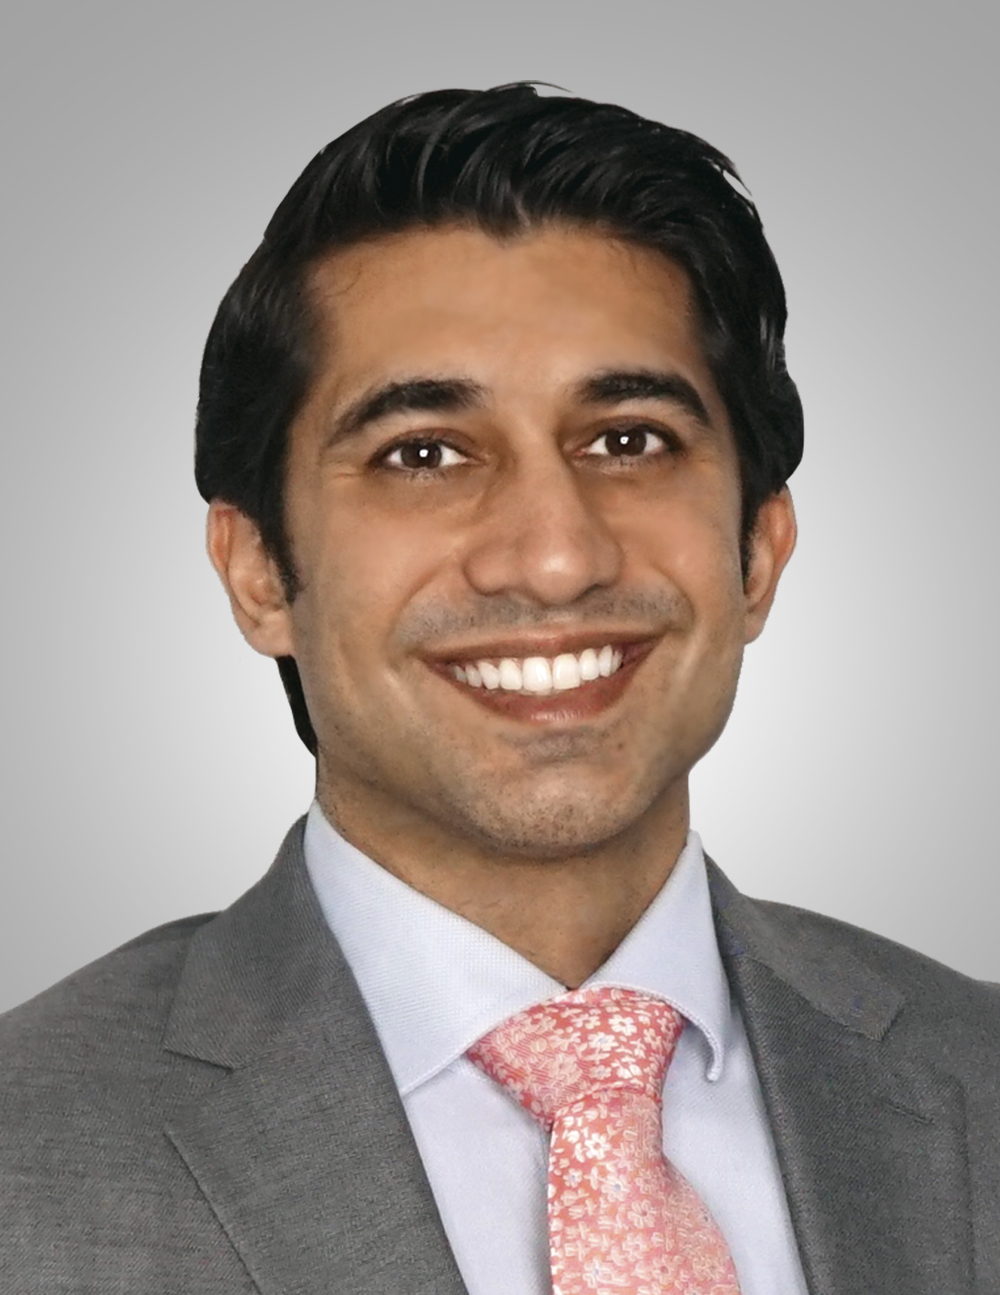 Dr. Chris Lakhiani